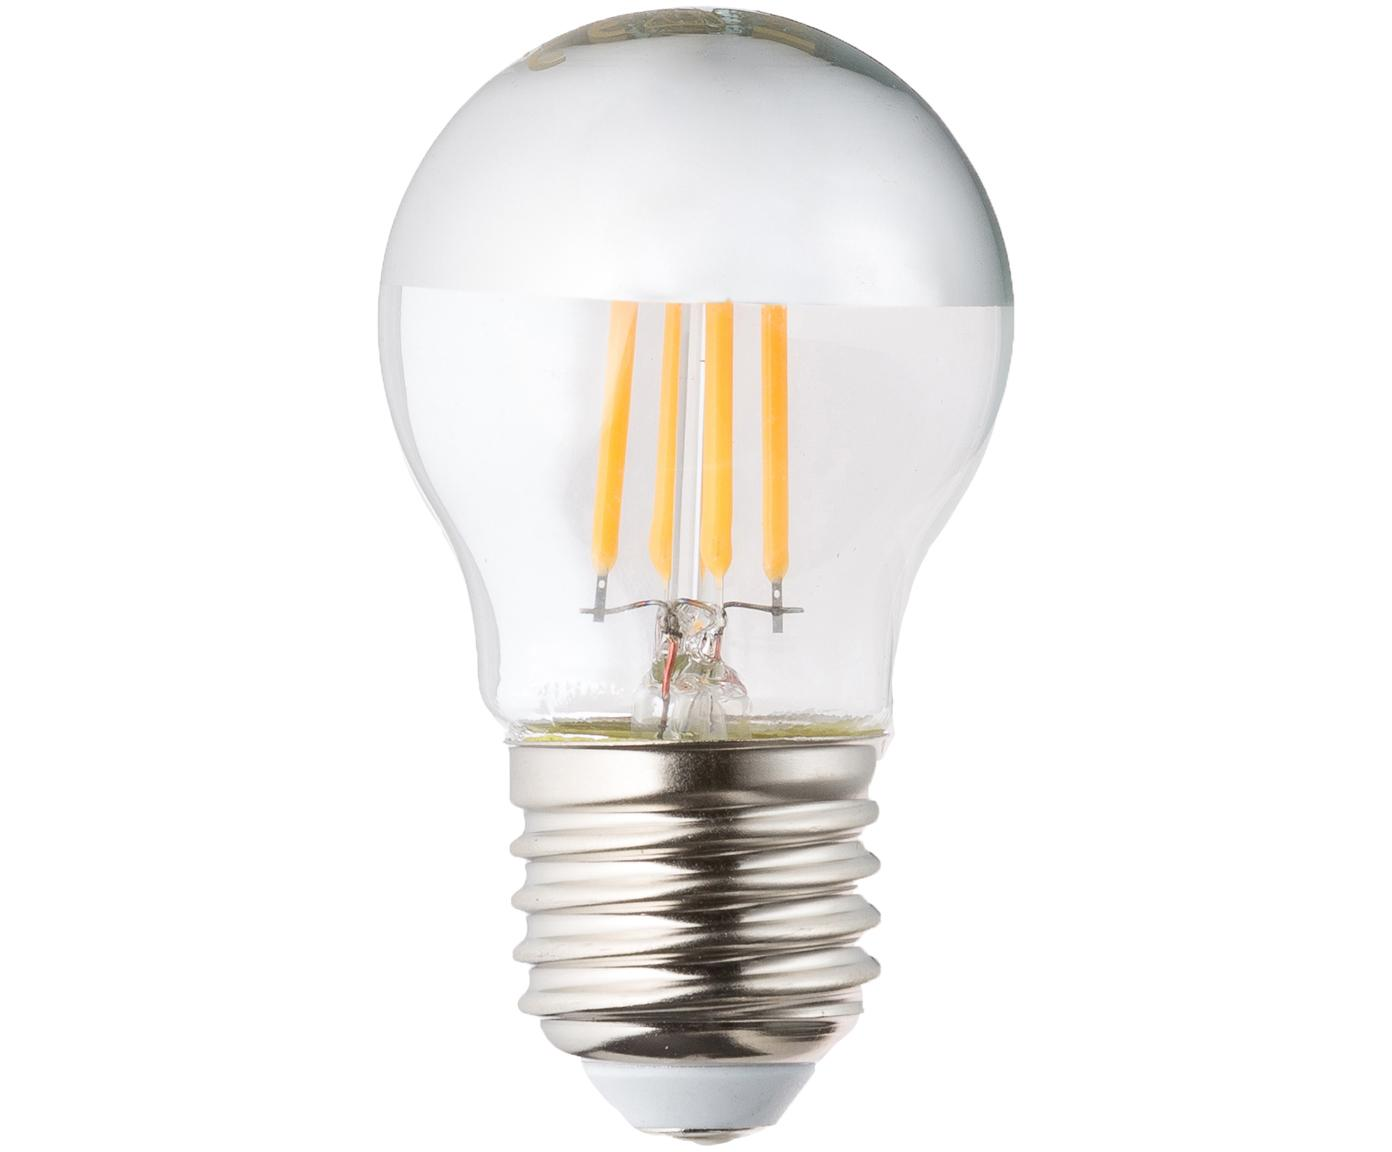 Dimmbare Leuchtmittel Gamiel (E27/4,8W), 3 Stück, Leuchtmittelschirm: Glas,verchromt, Leuchtmittelfassung: Aluminium, Transparent, Chrom, Ø 5 x H 8 cm